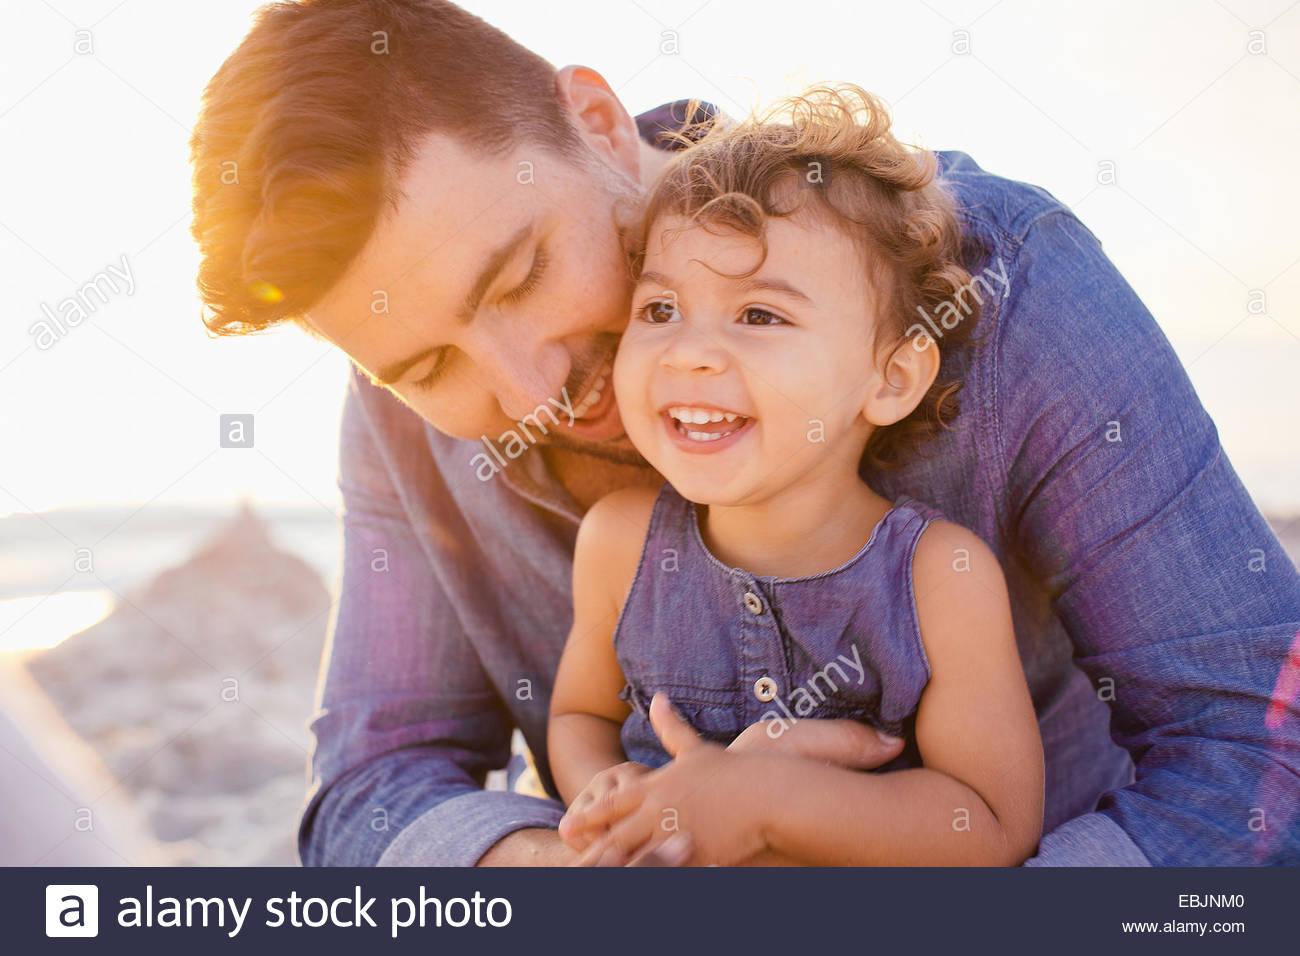 Retrato de padre e hija infante en playa, Toscana, Italia Imagen De Stock